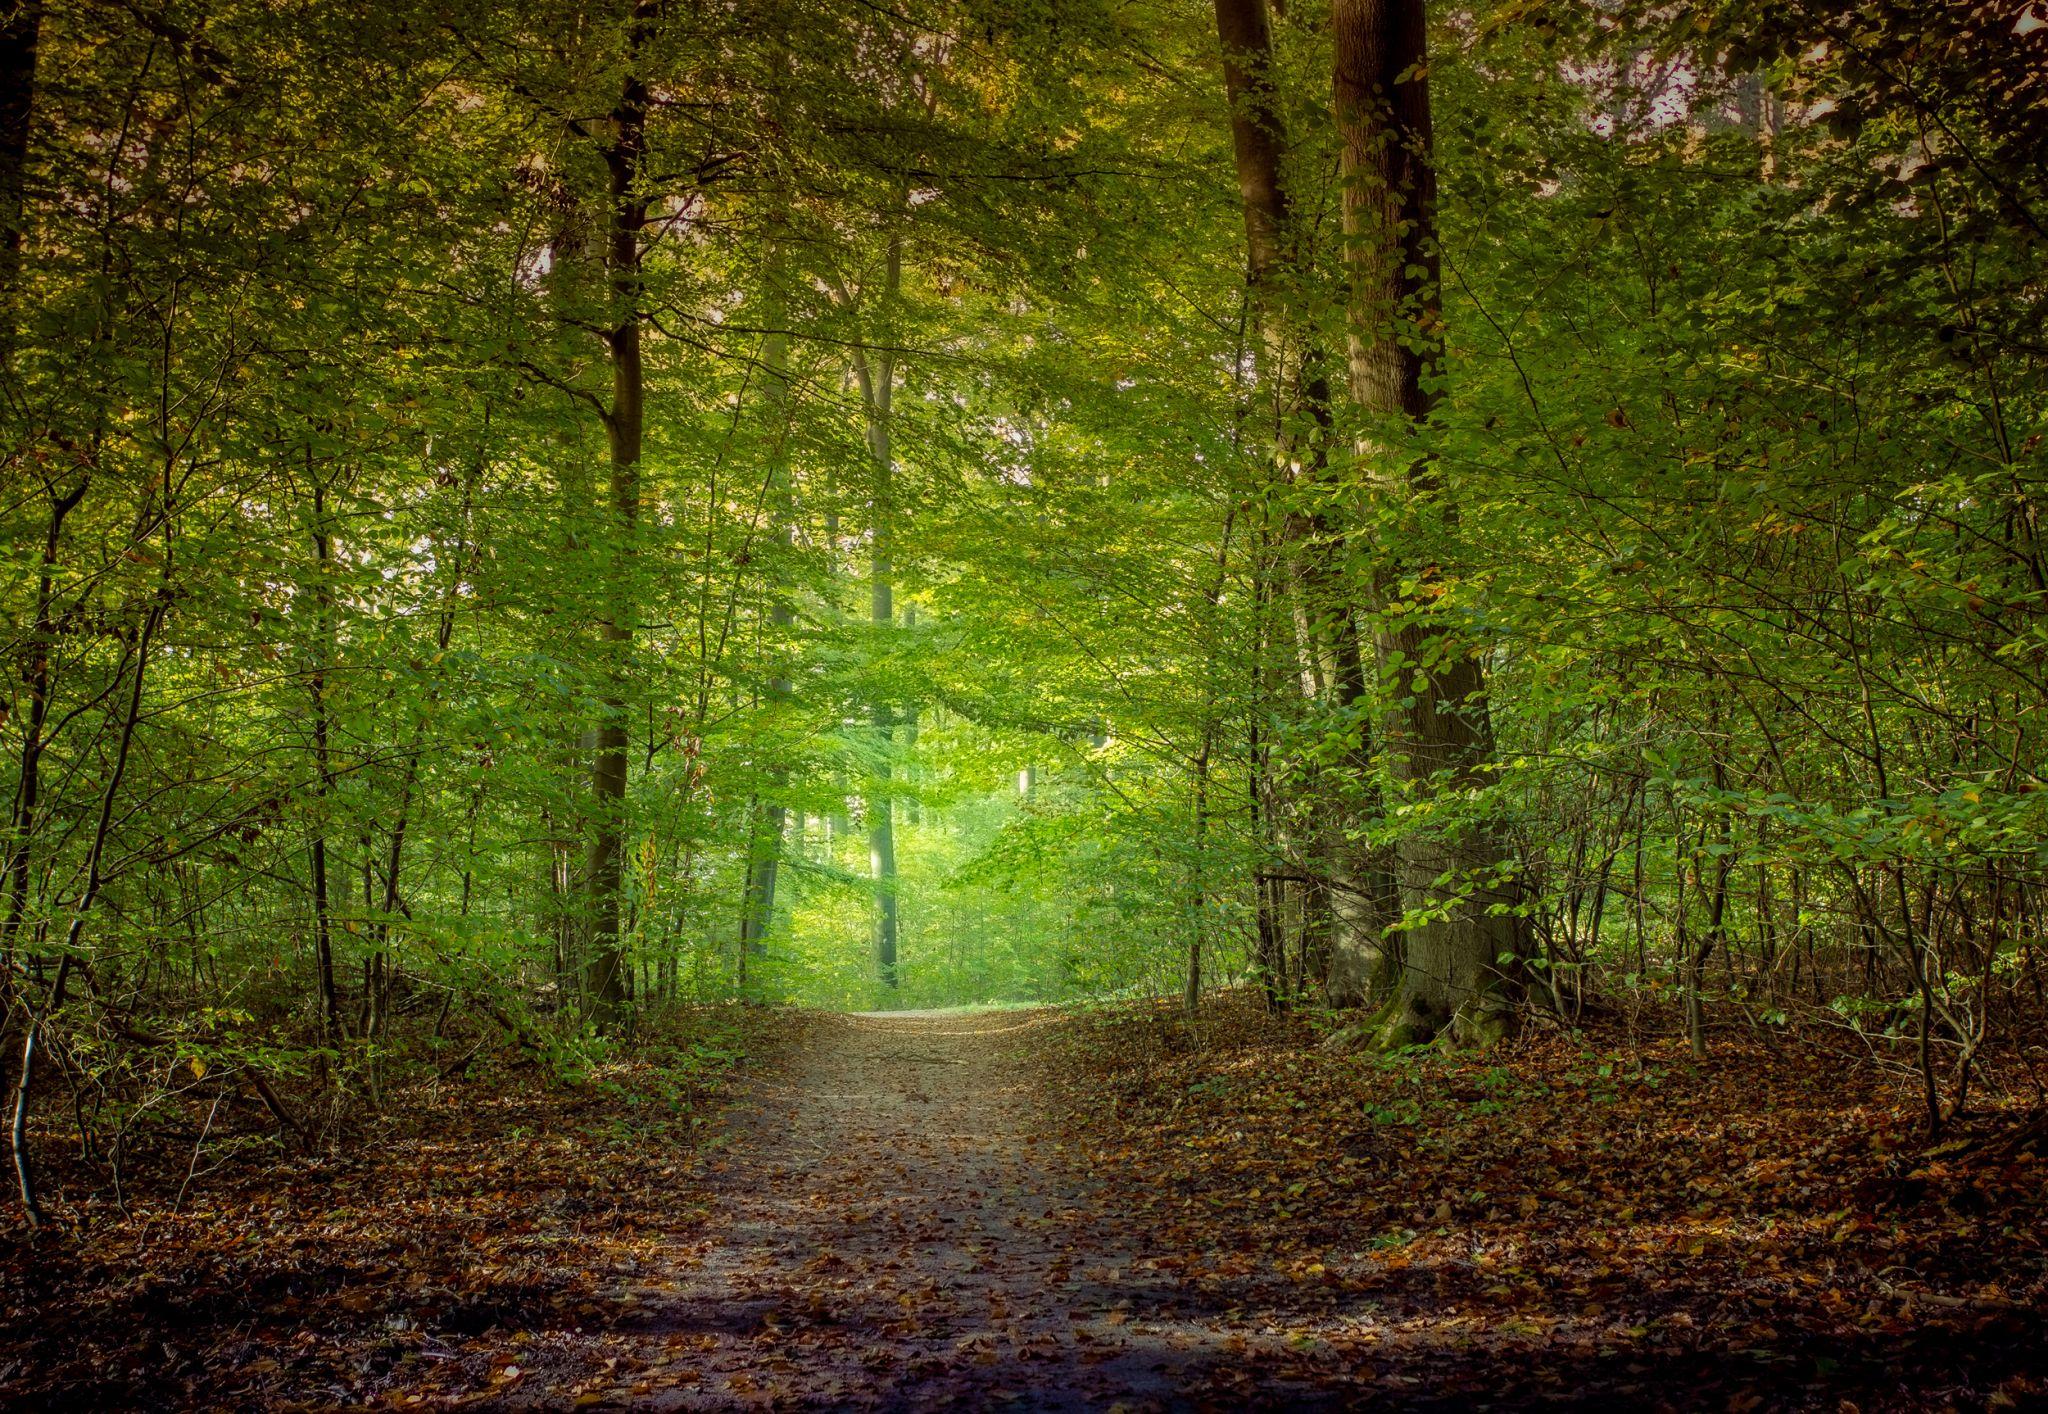 Woods Bad Falingbostel, Germany